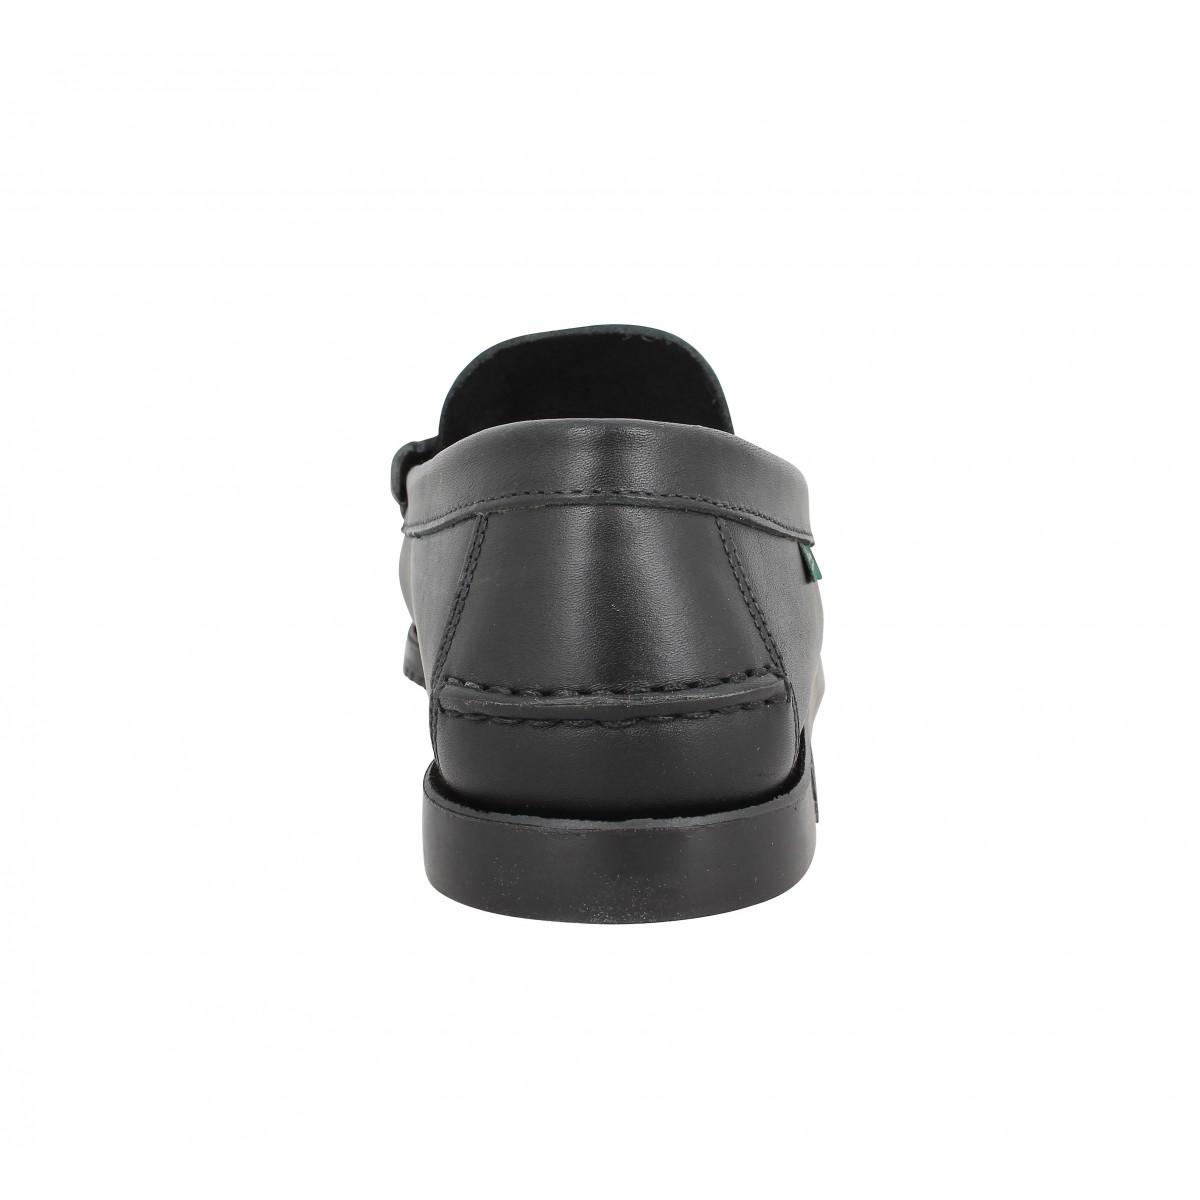 paraboot coraux cuir homme noir fanny chaussures. Black Bedroom Furniture Sets. Home Design Ideas